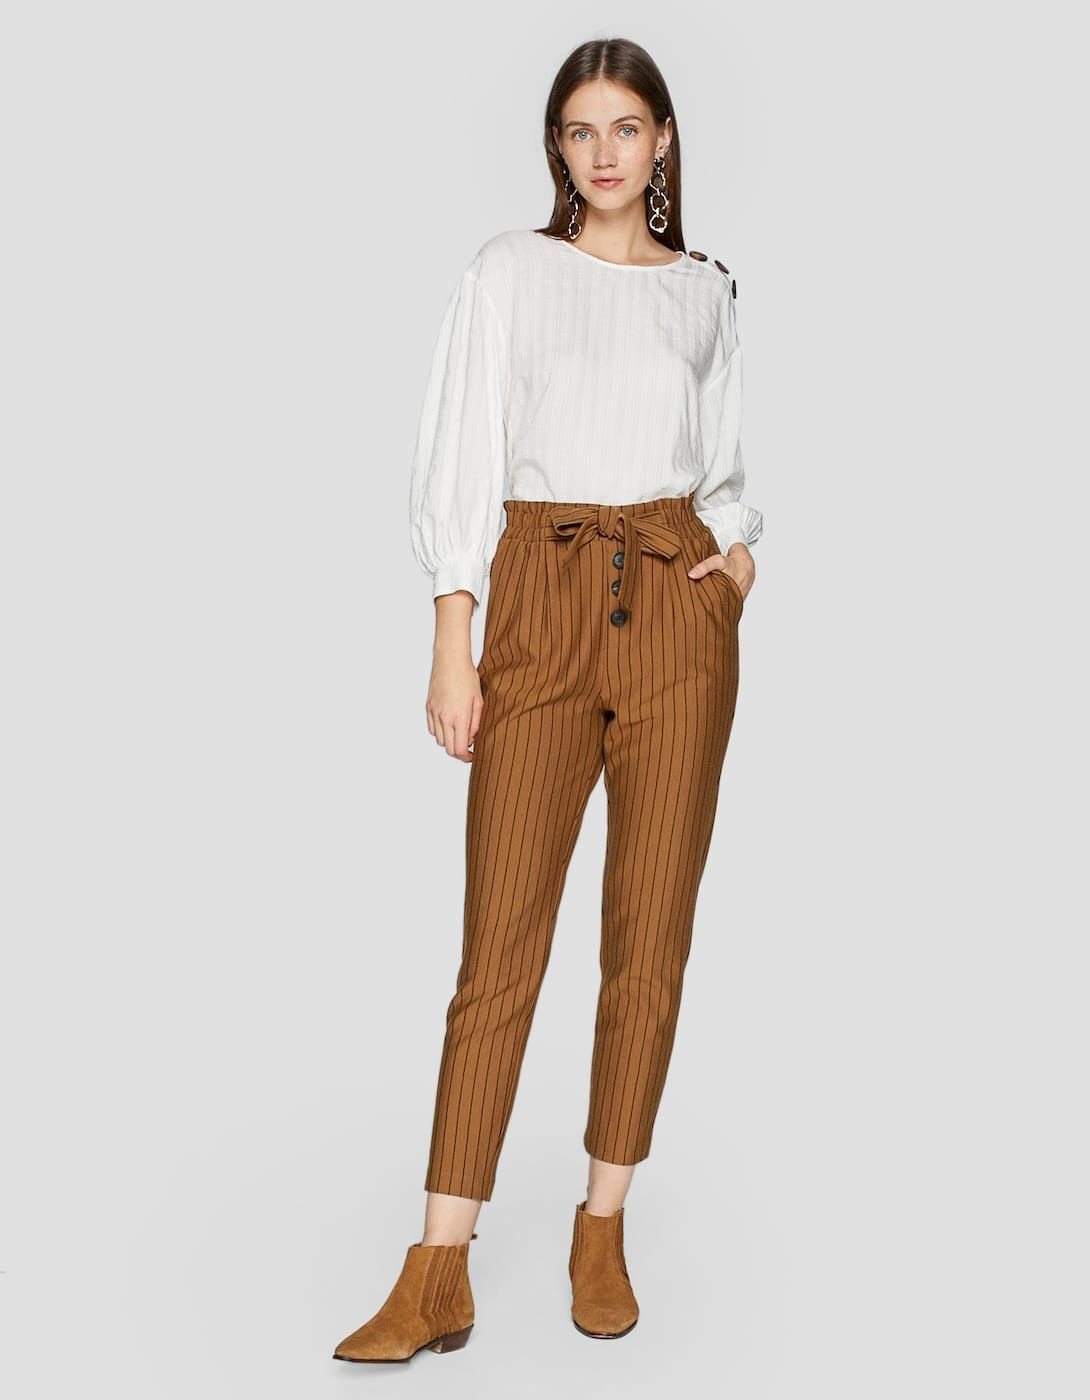 Pantalón baggy botones - Pantalones de mujer  48f4b605f69a